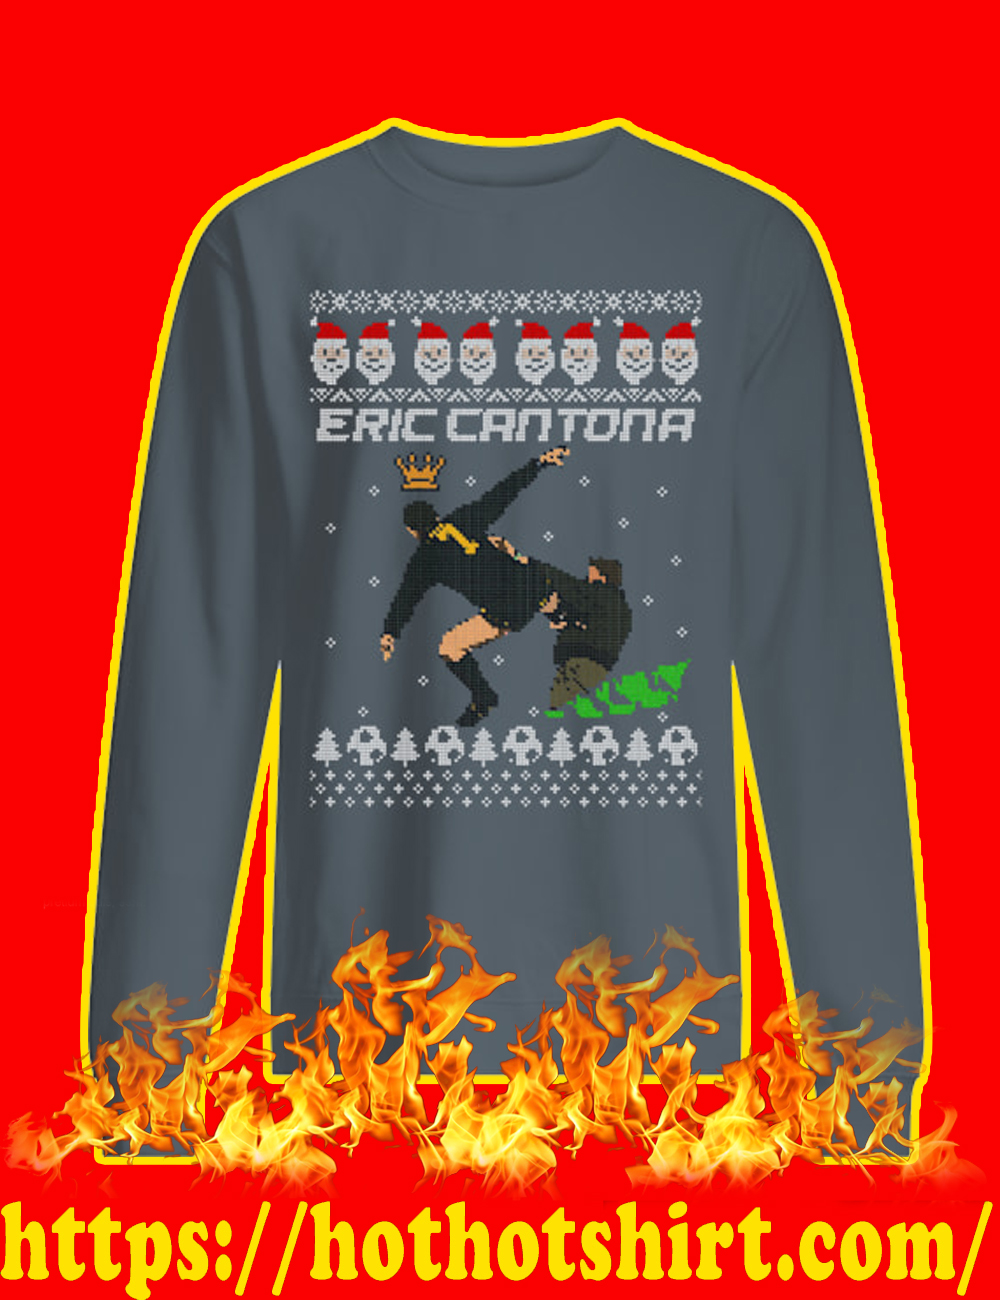 Eric Cantona Kung Fu Kick Sweater-grey